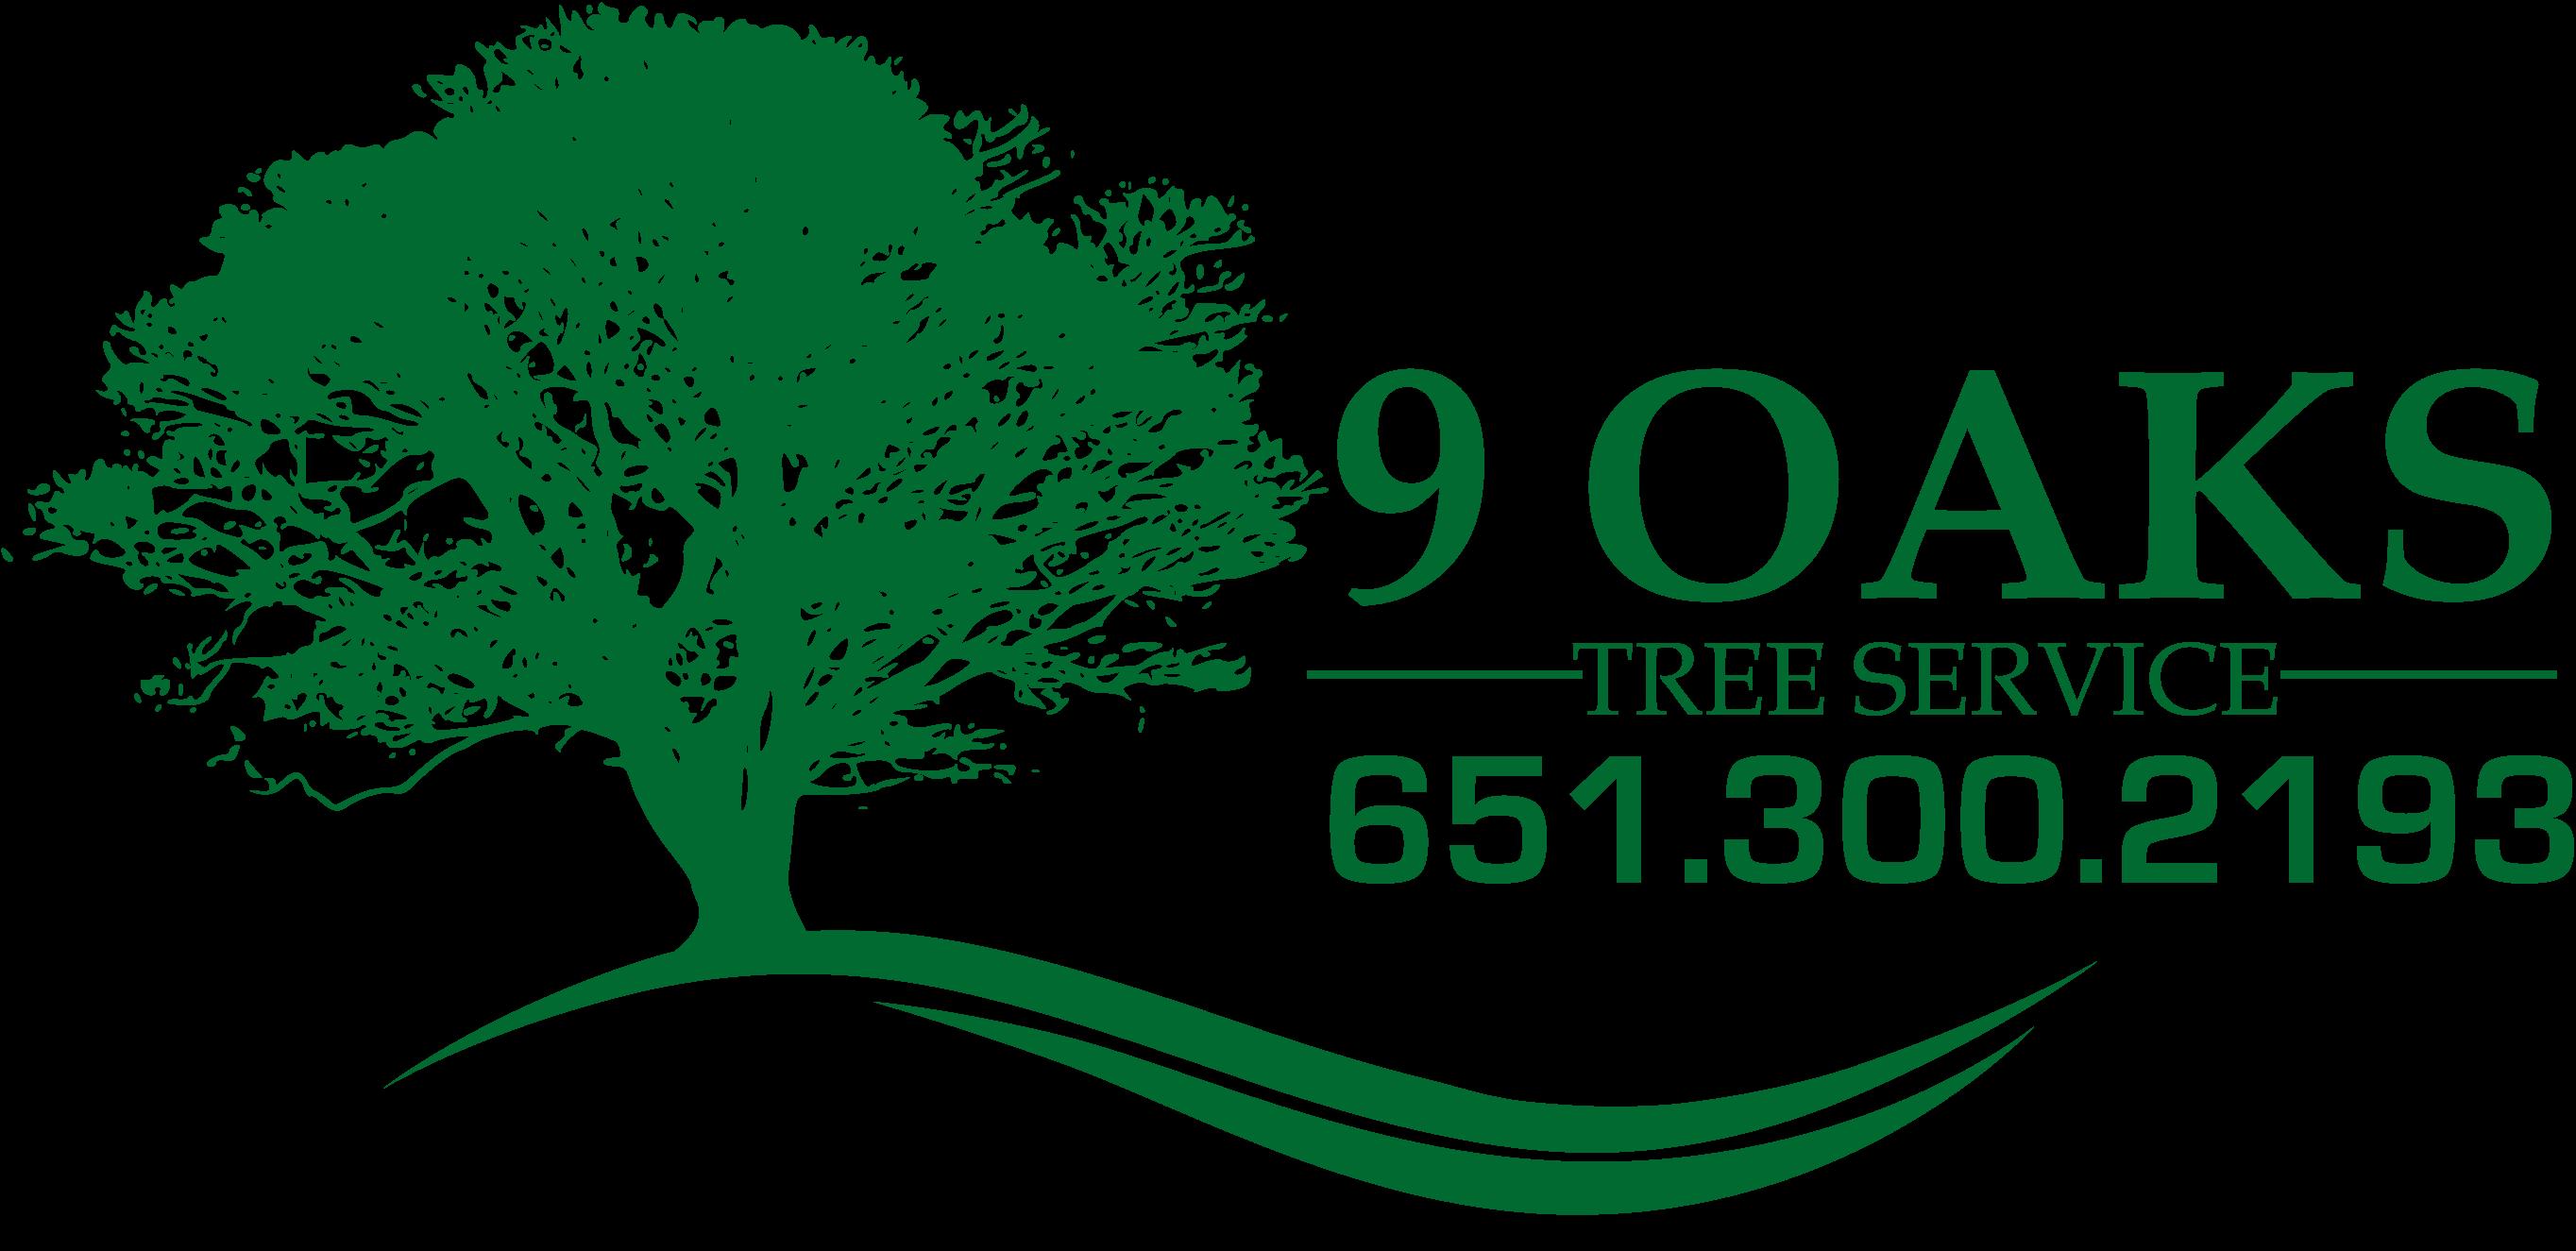 Tree Service Woodbury MN | Tree Service St. Paul MN